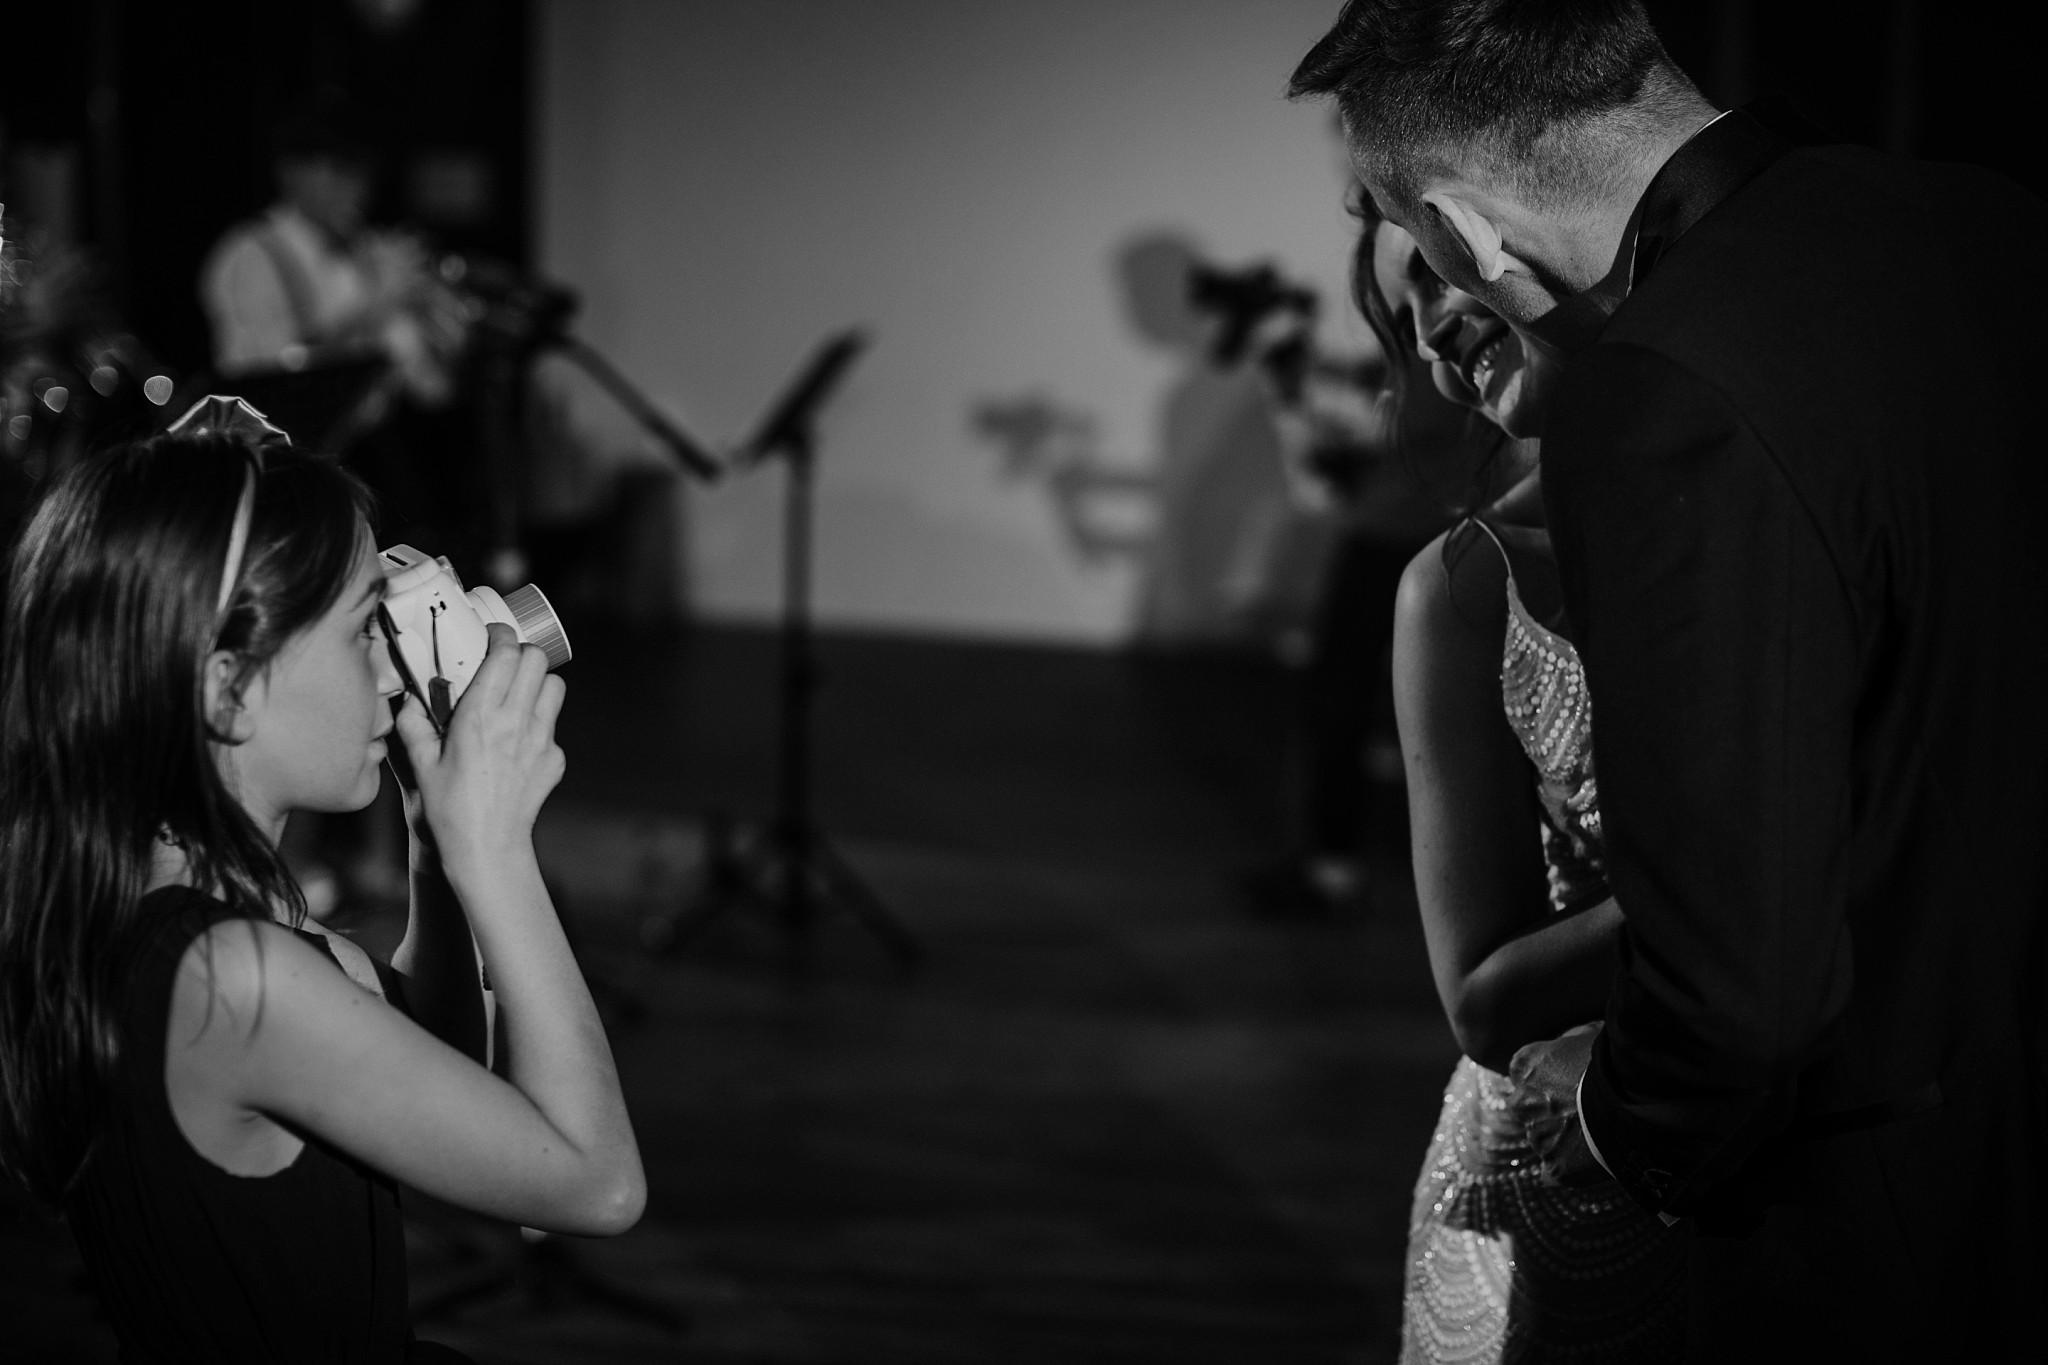 fotograf poznan wesele dobra truskawka piekne wesele pod poznaniem wesele w dobrej truskawce piekna para mloda slub marzen slub koronawirus slub listopad wesele koronawirus 468